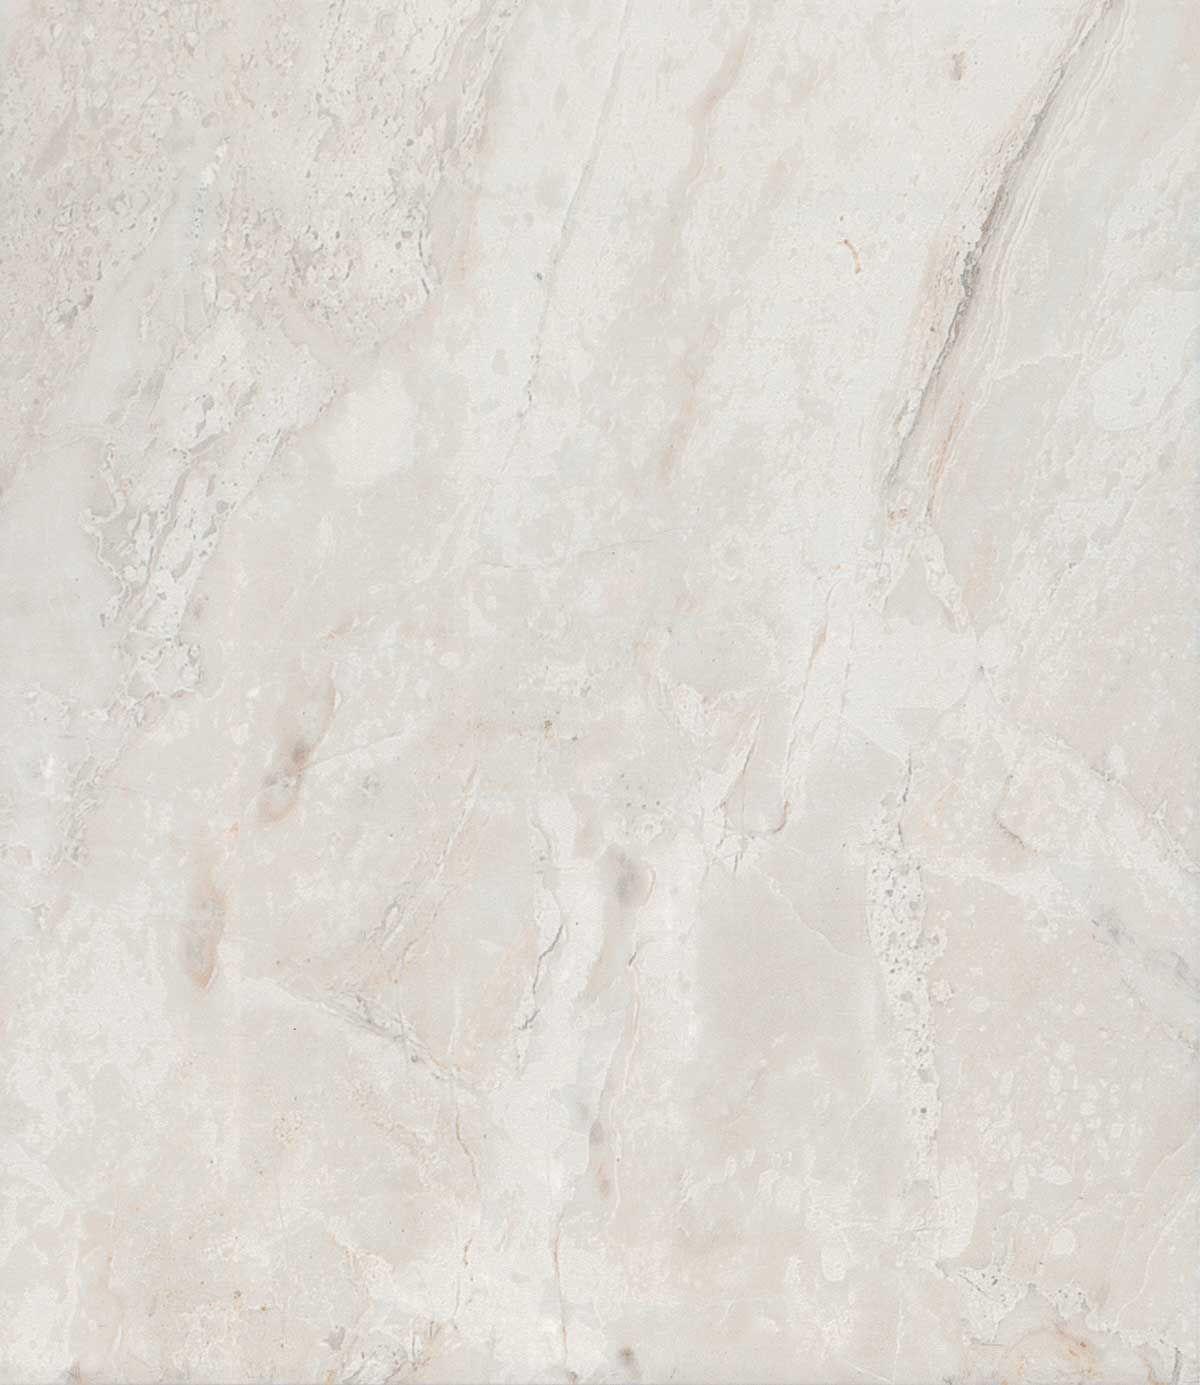 Positano blanco glazed porcelain floor by roca porcelain tiles positano blanco ceramic wall tile x dailygadgetfo Images